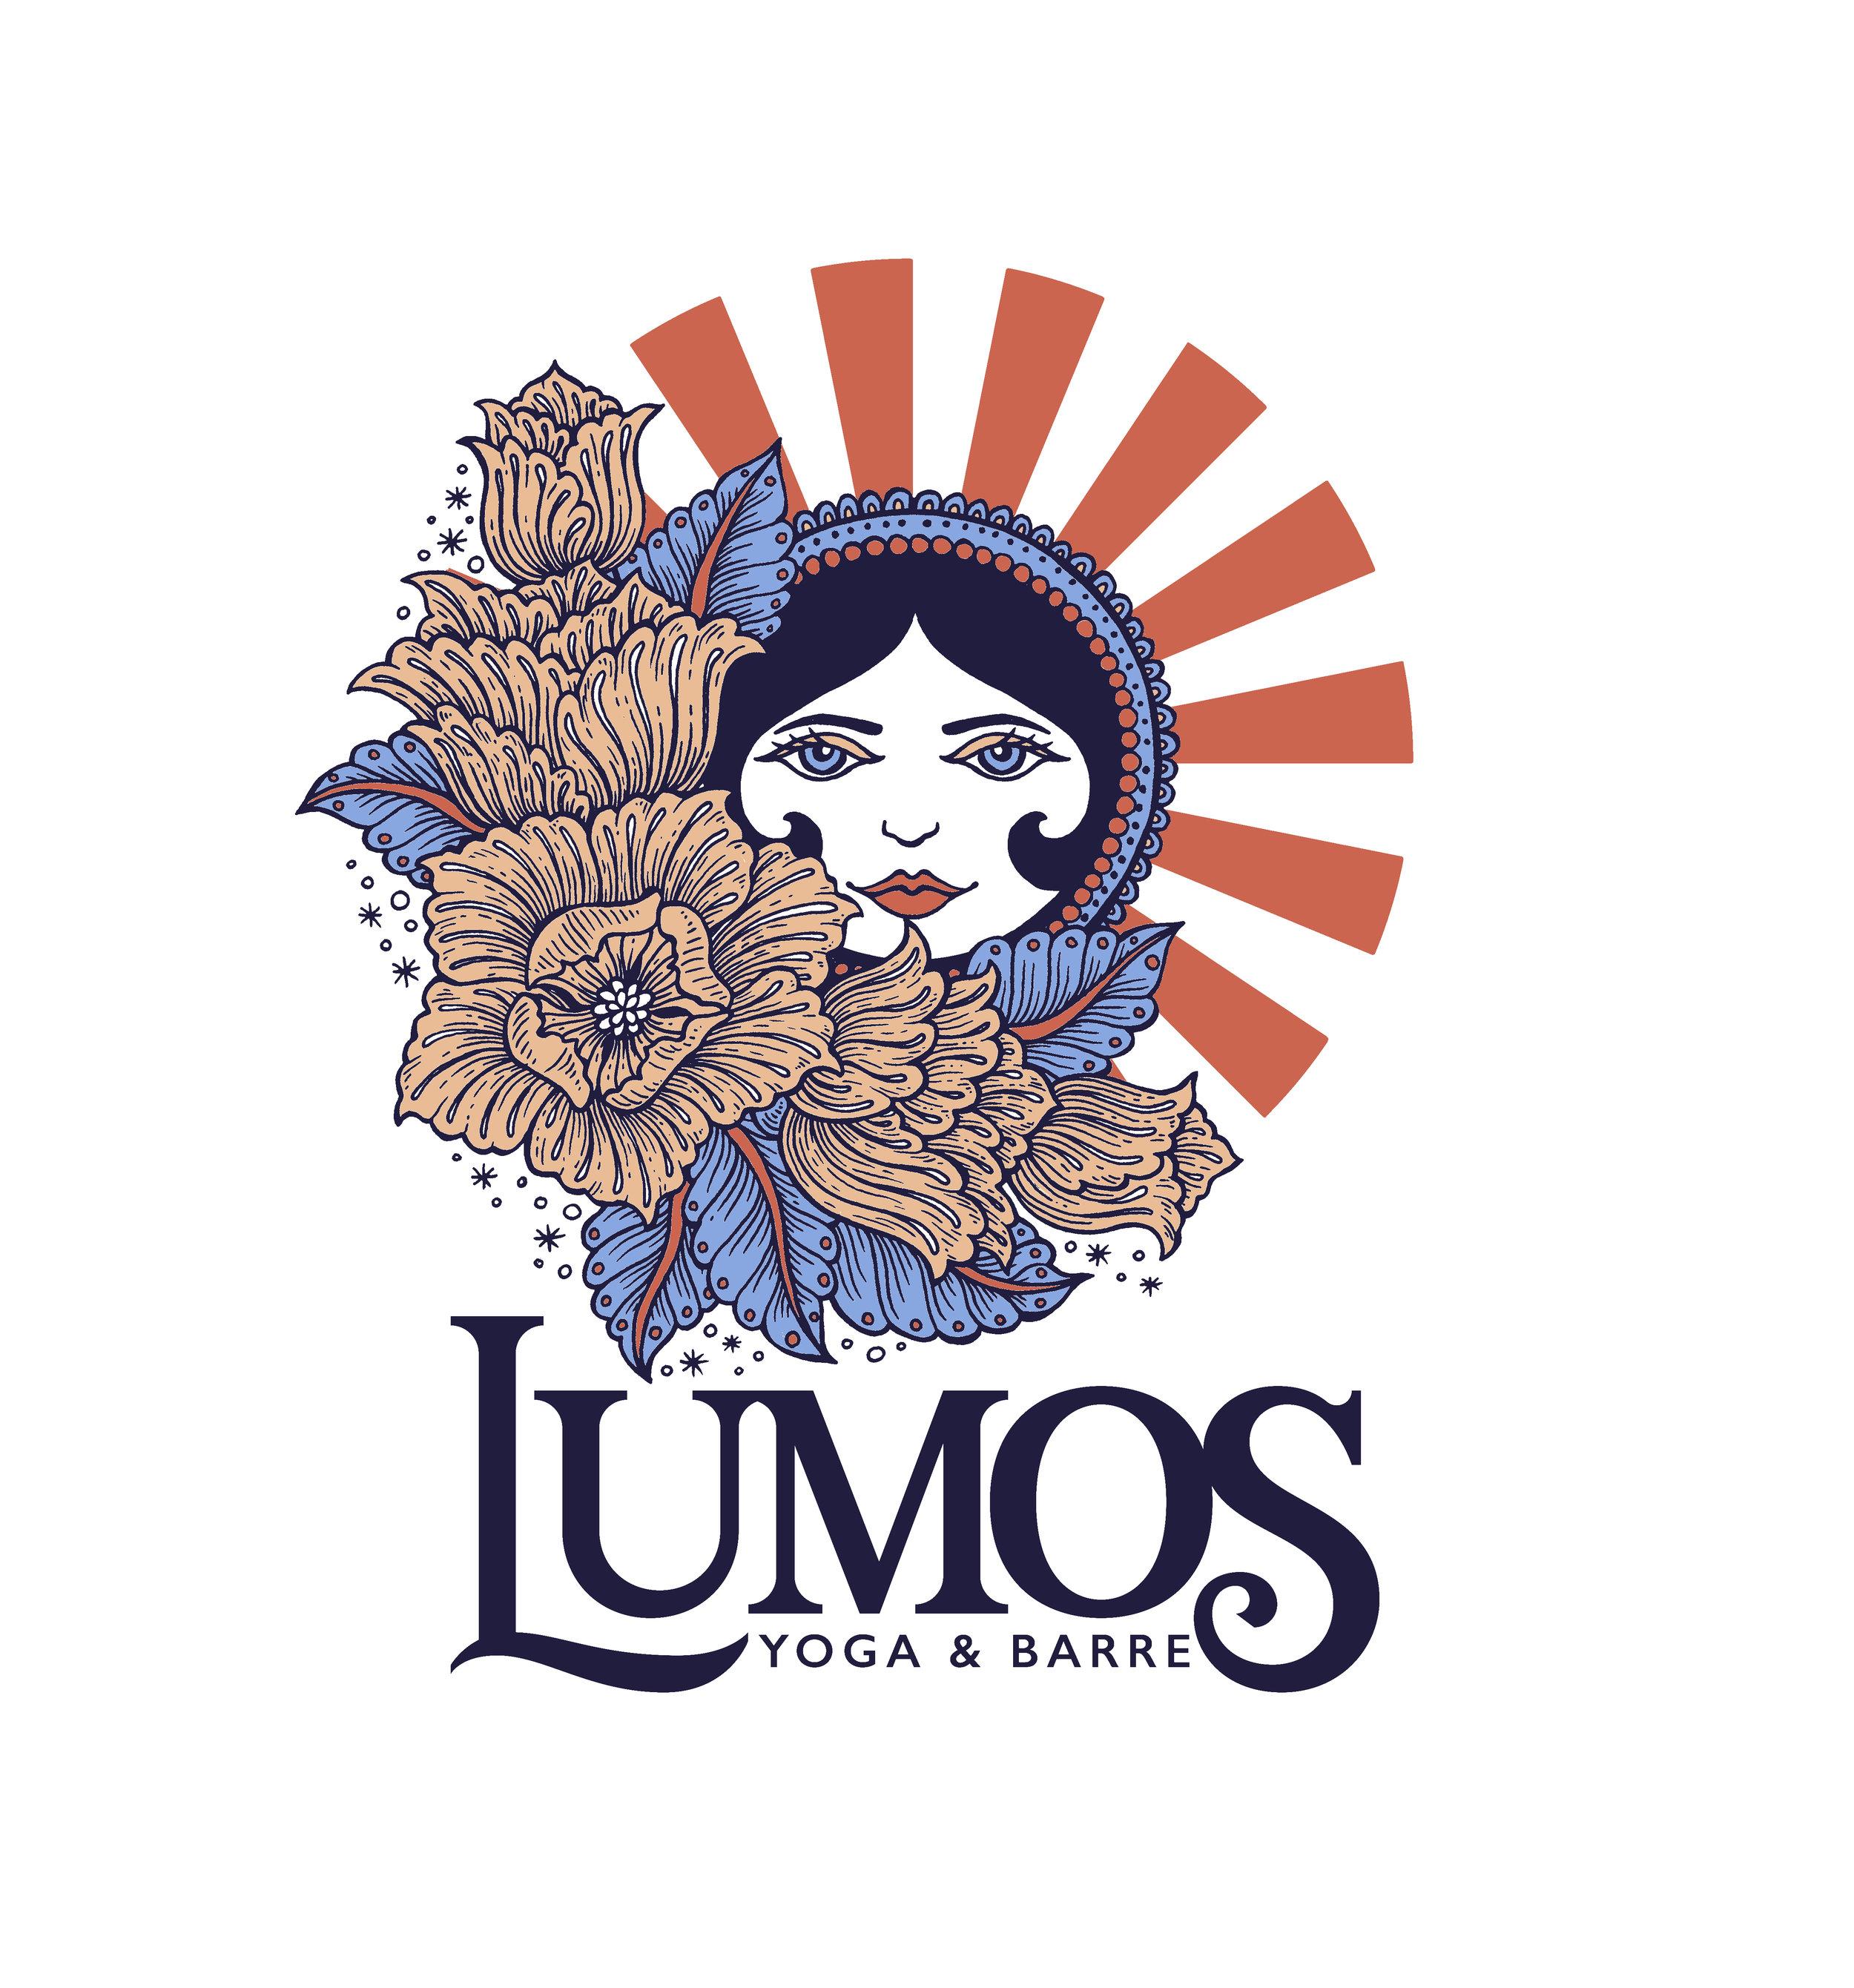 Lumos-v2.jpg